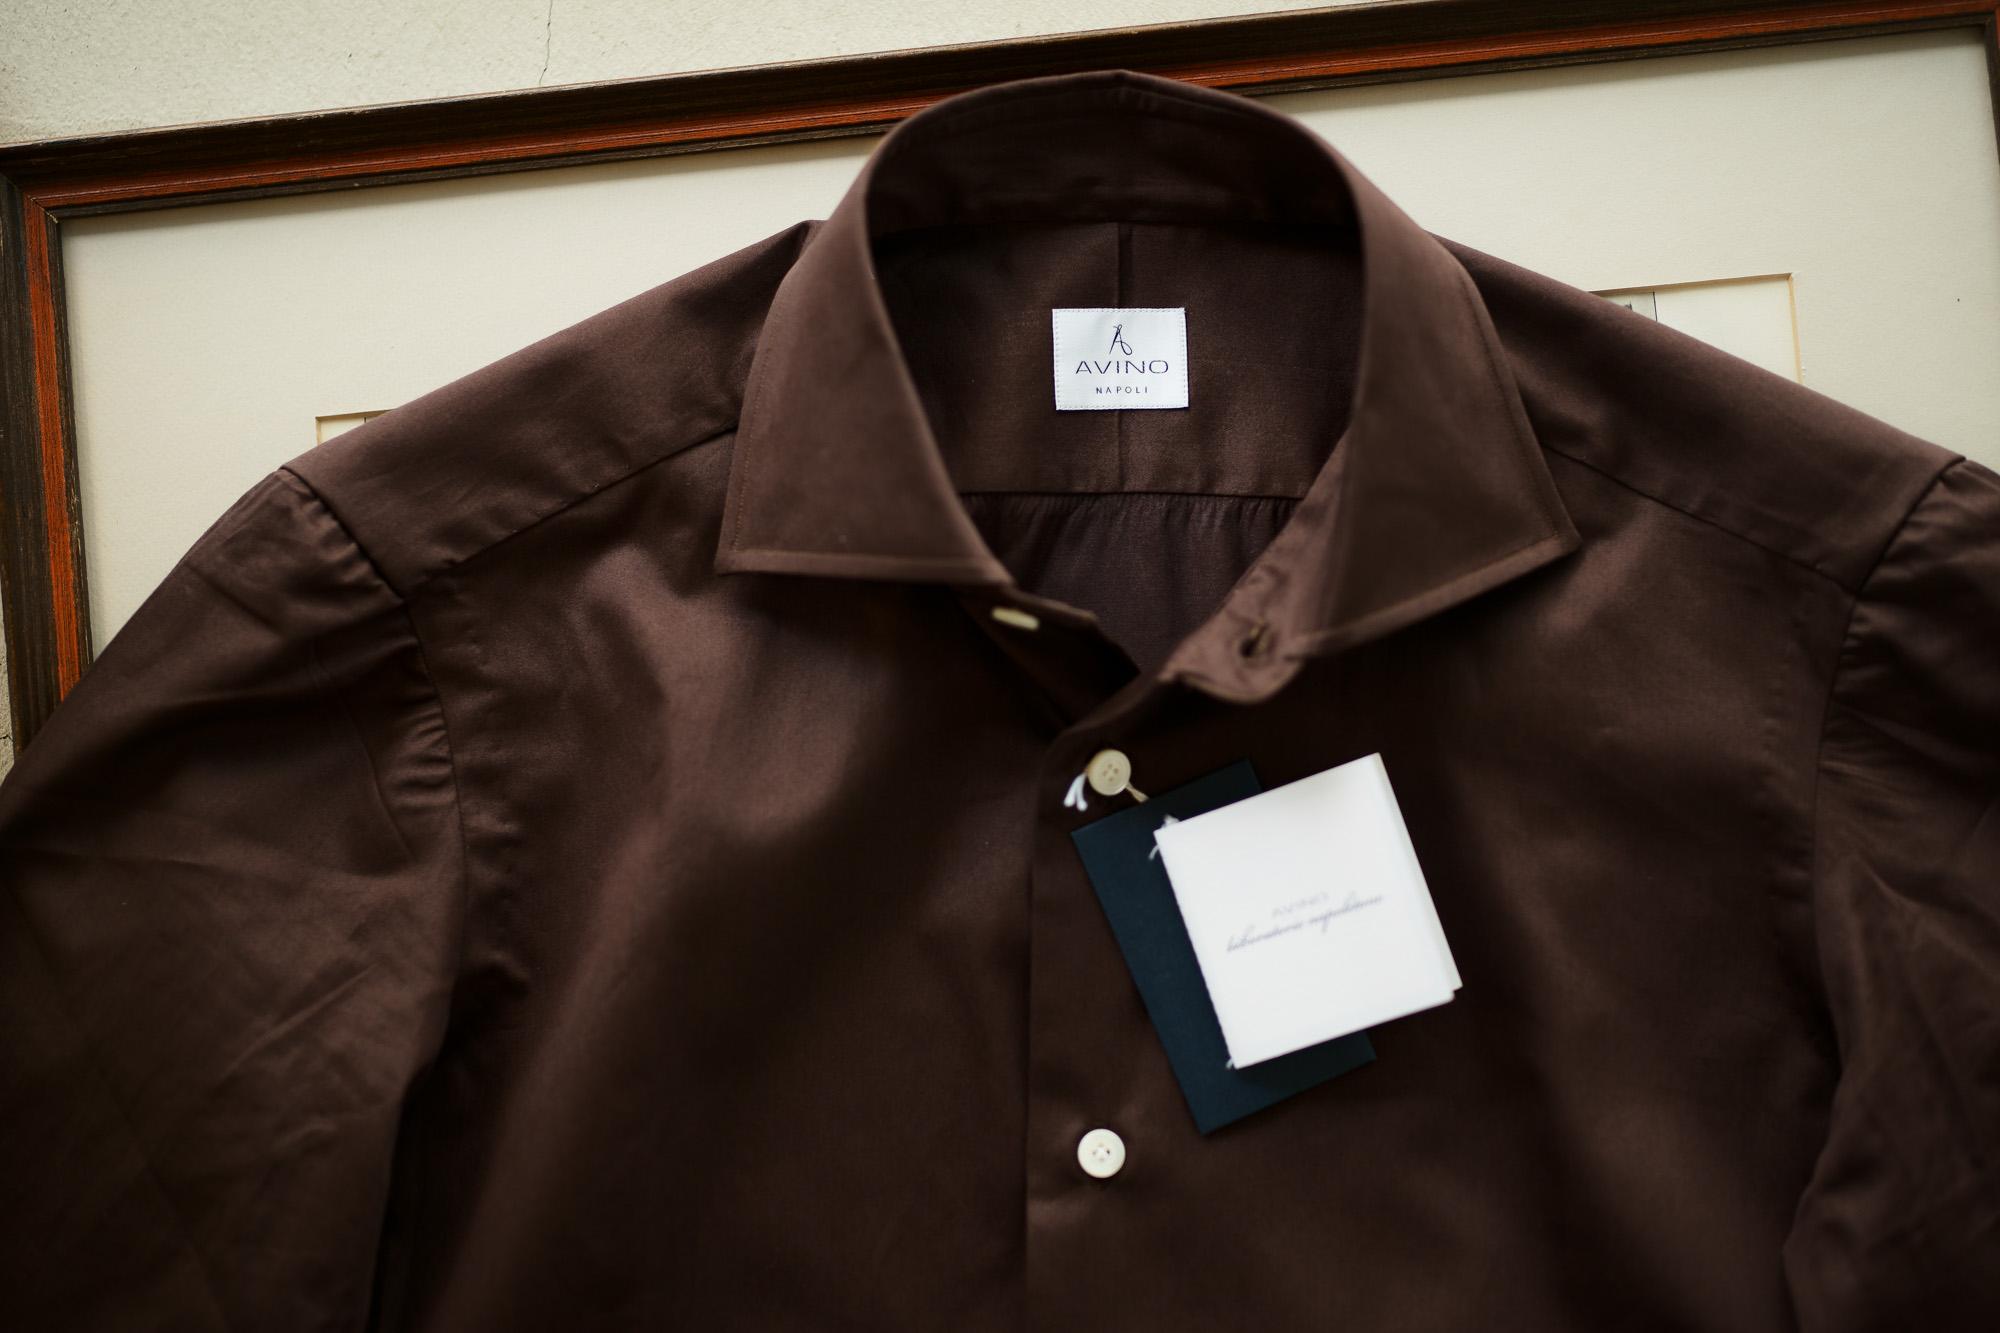 AVINO(アヴィーノ) Poplin Dress Shirts コットン ブロード ポプリン ドレスシャツ BROWN(ブラウン) made in italy (イタリア製) 2019 秋冬 愛知 名古屋 altoediritto アルトエデリット